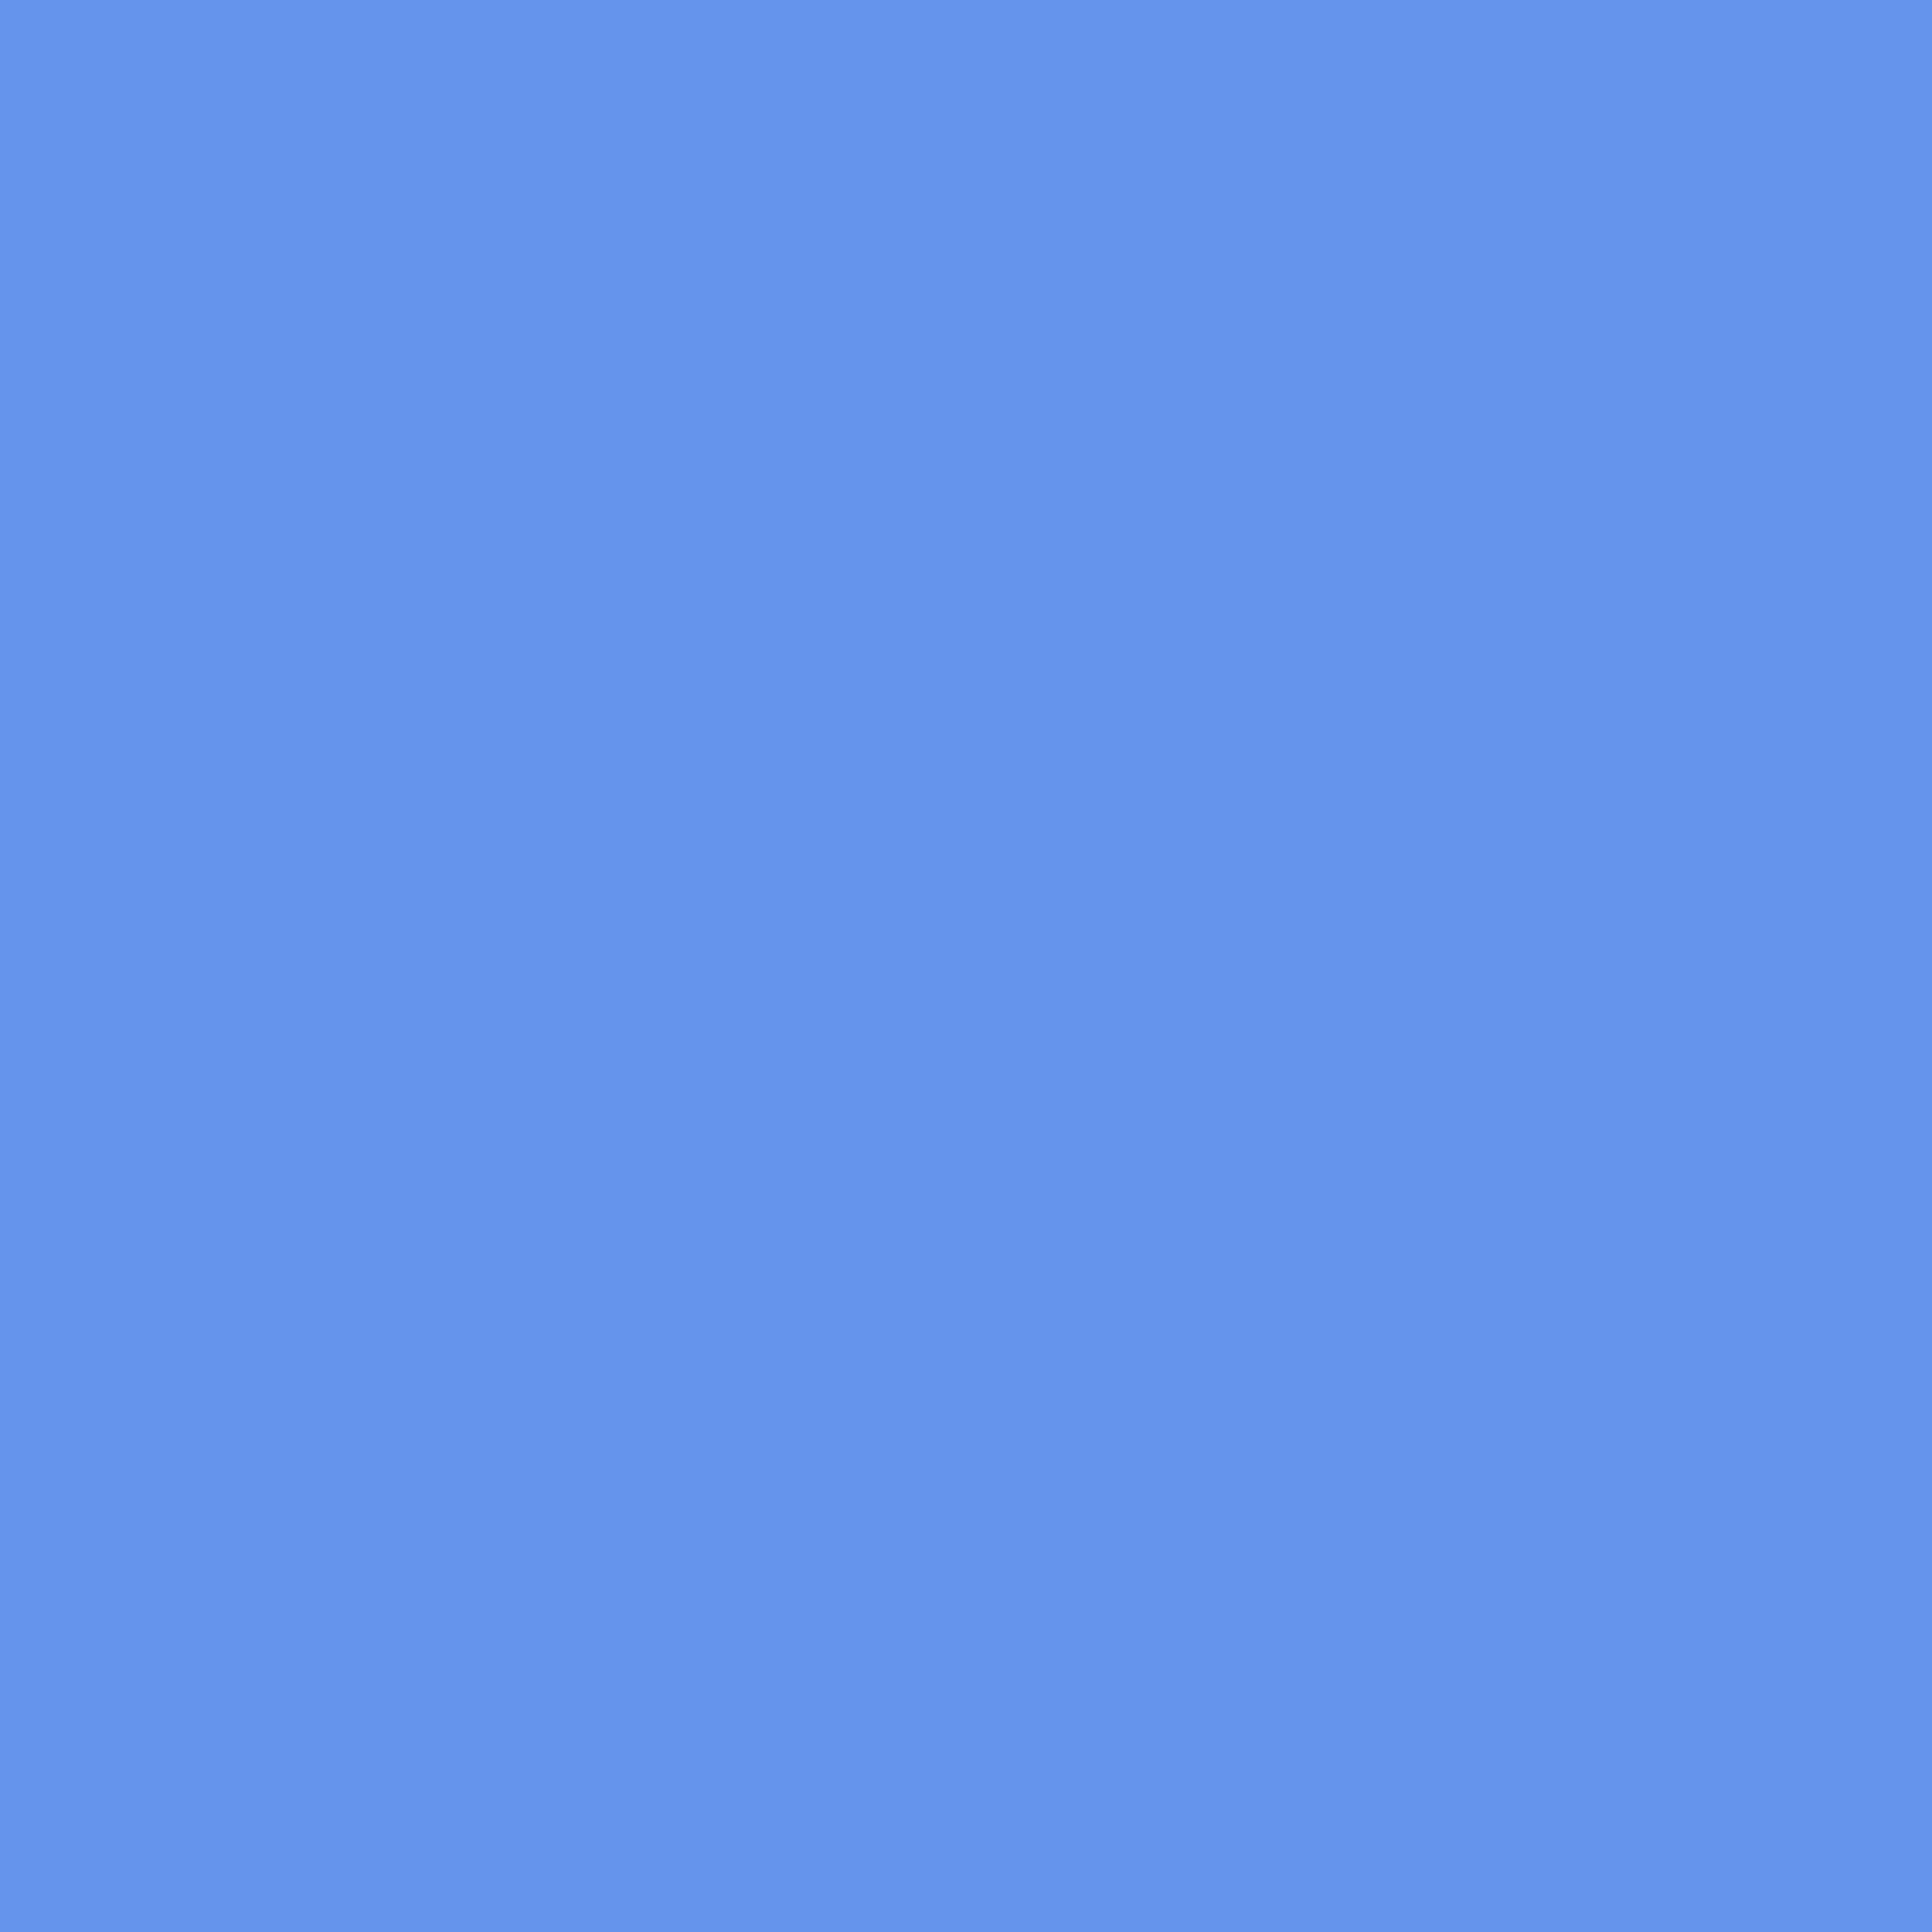 2048x2048 Cornflower Blue Solid Color Background